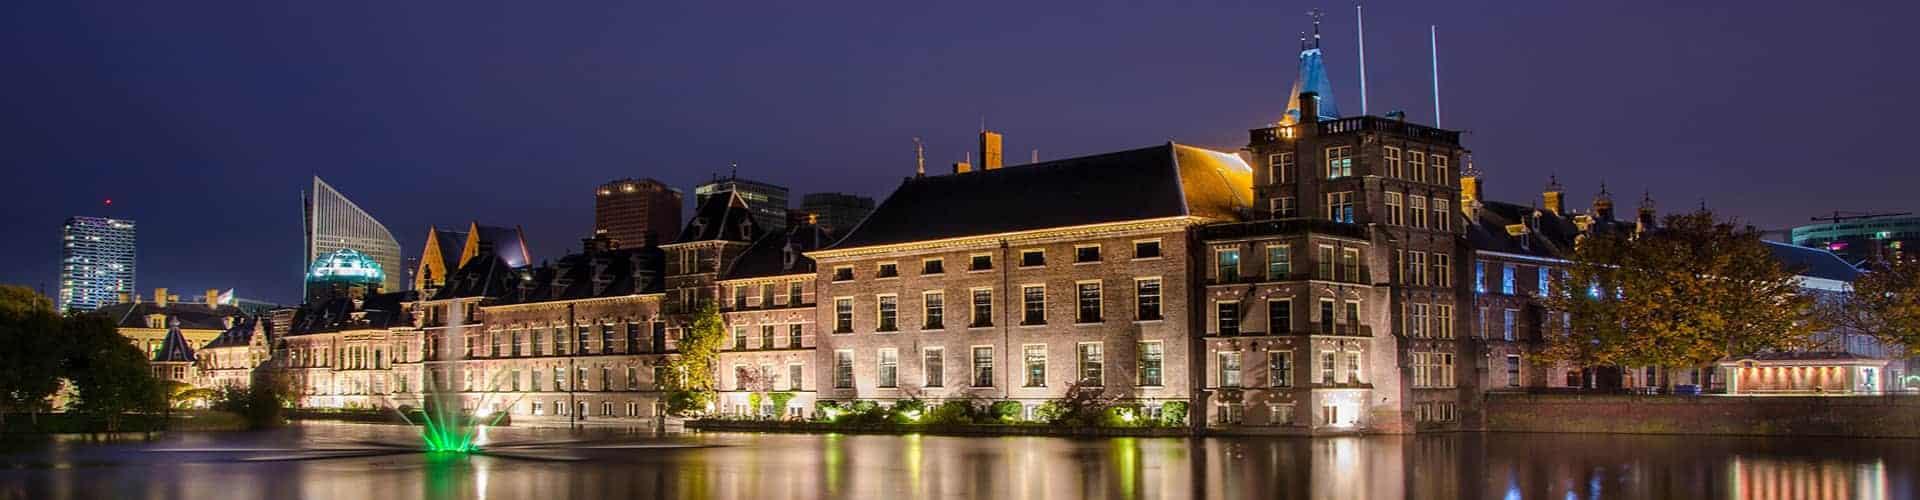 Free Tour La Haya - Turismo Países Bajos